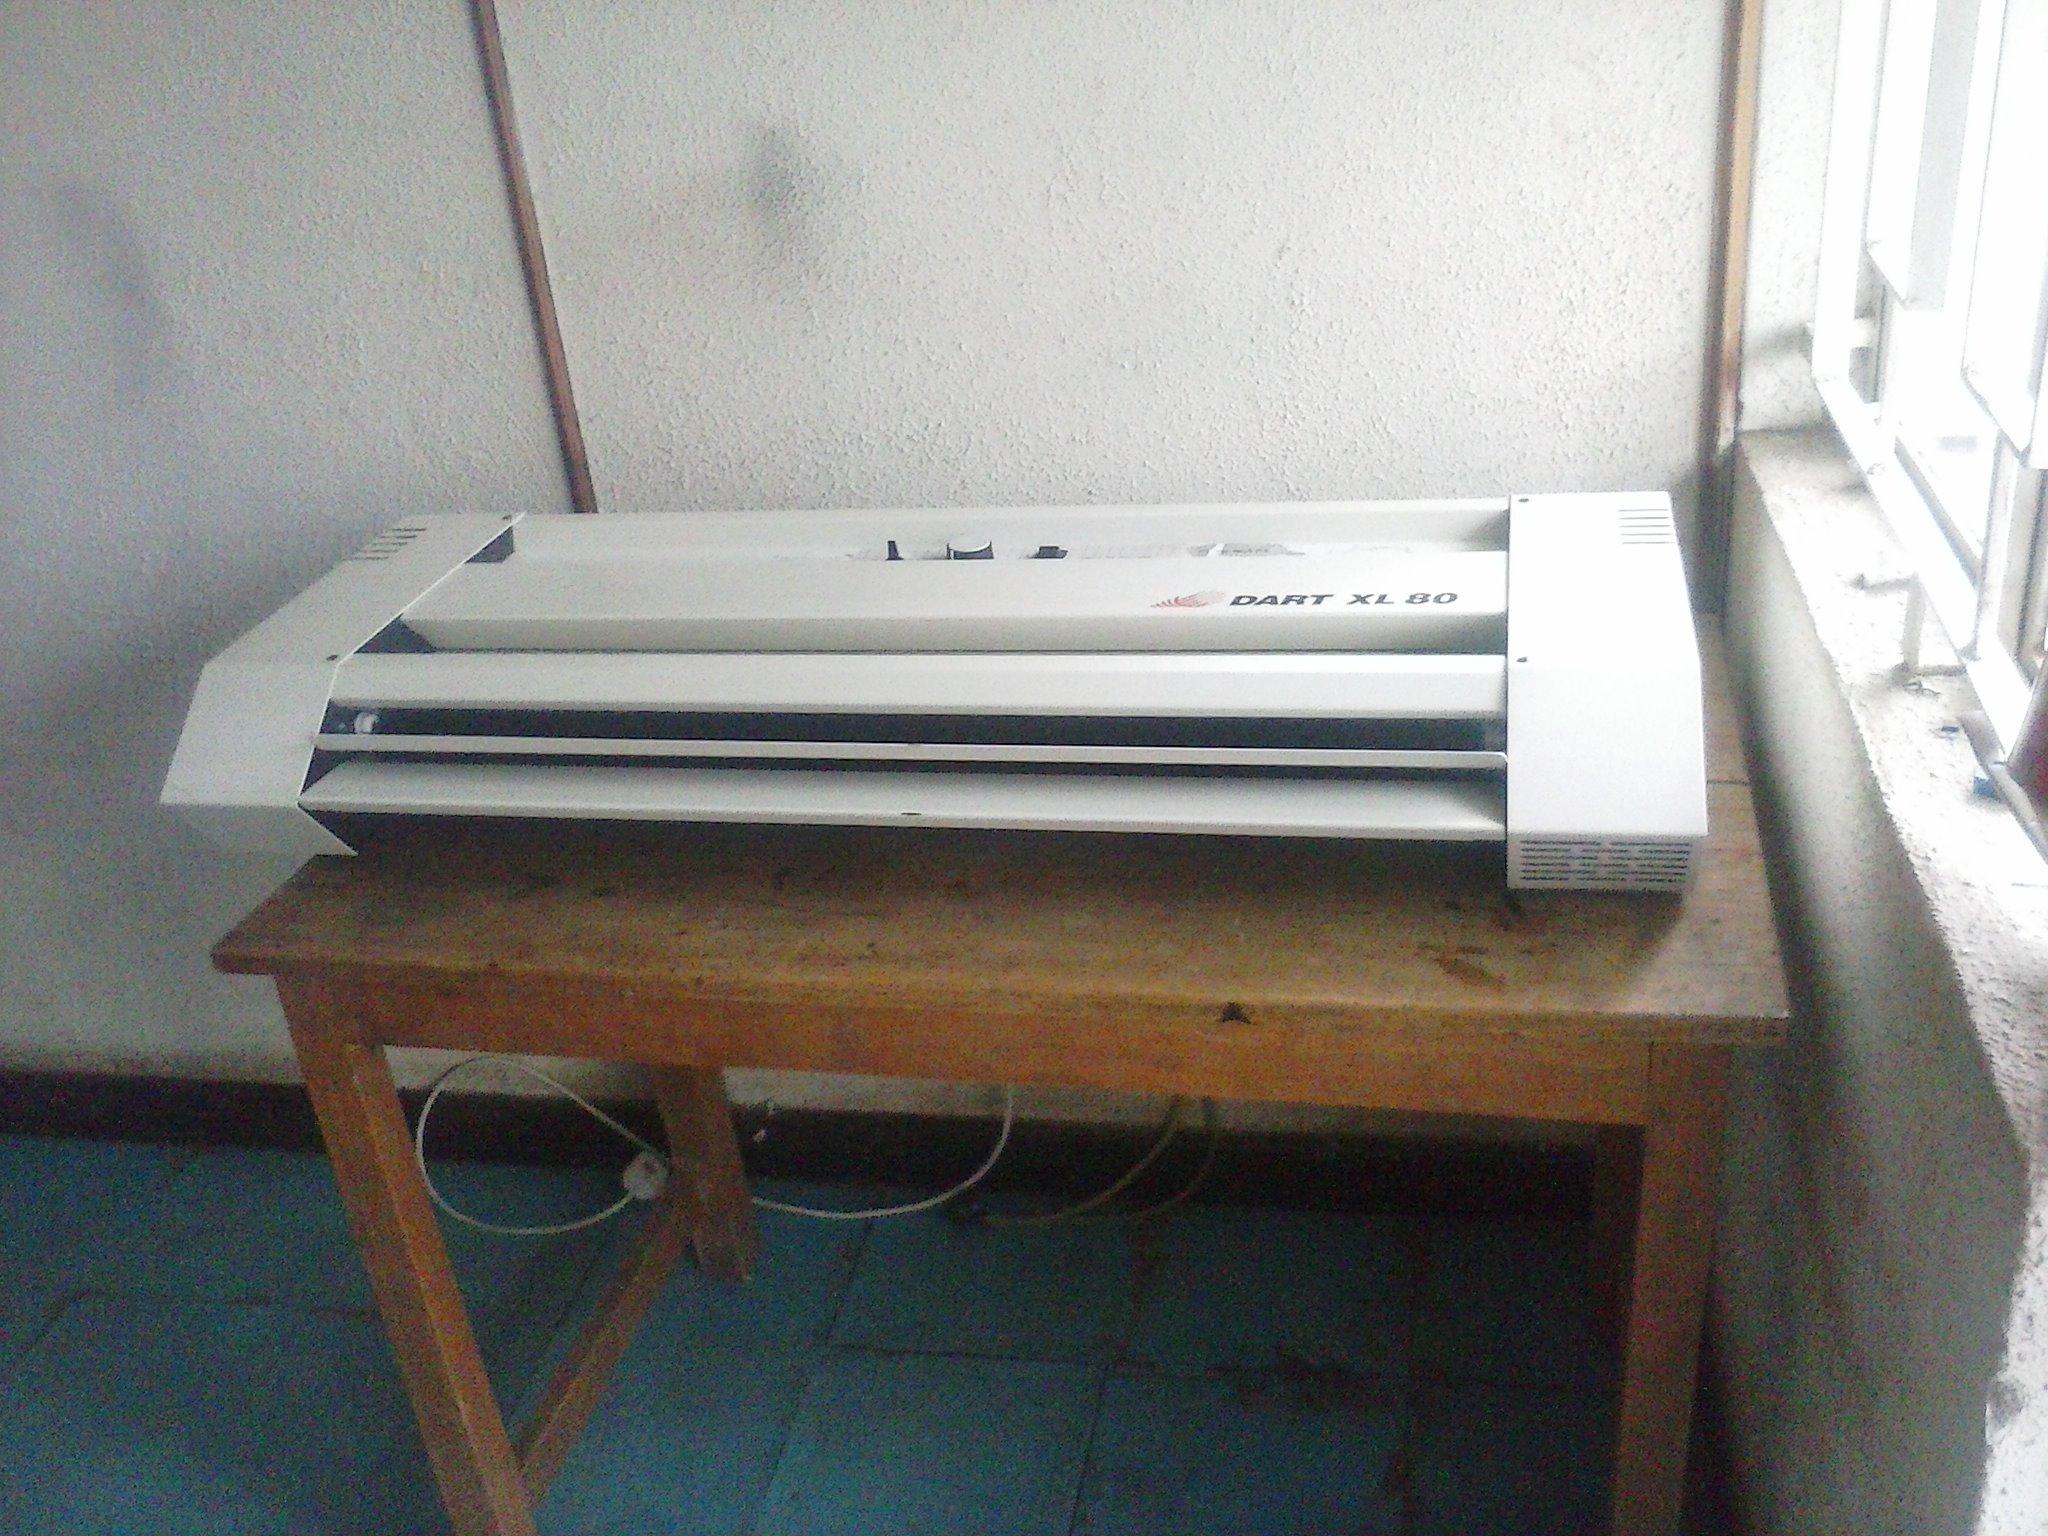 Diazit xl80 printer designjet maintenance company lightbox malvernweather Gallery